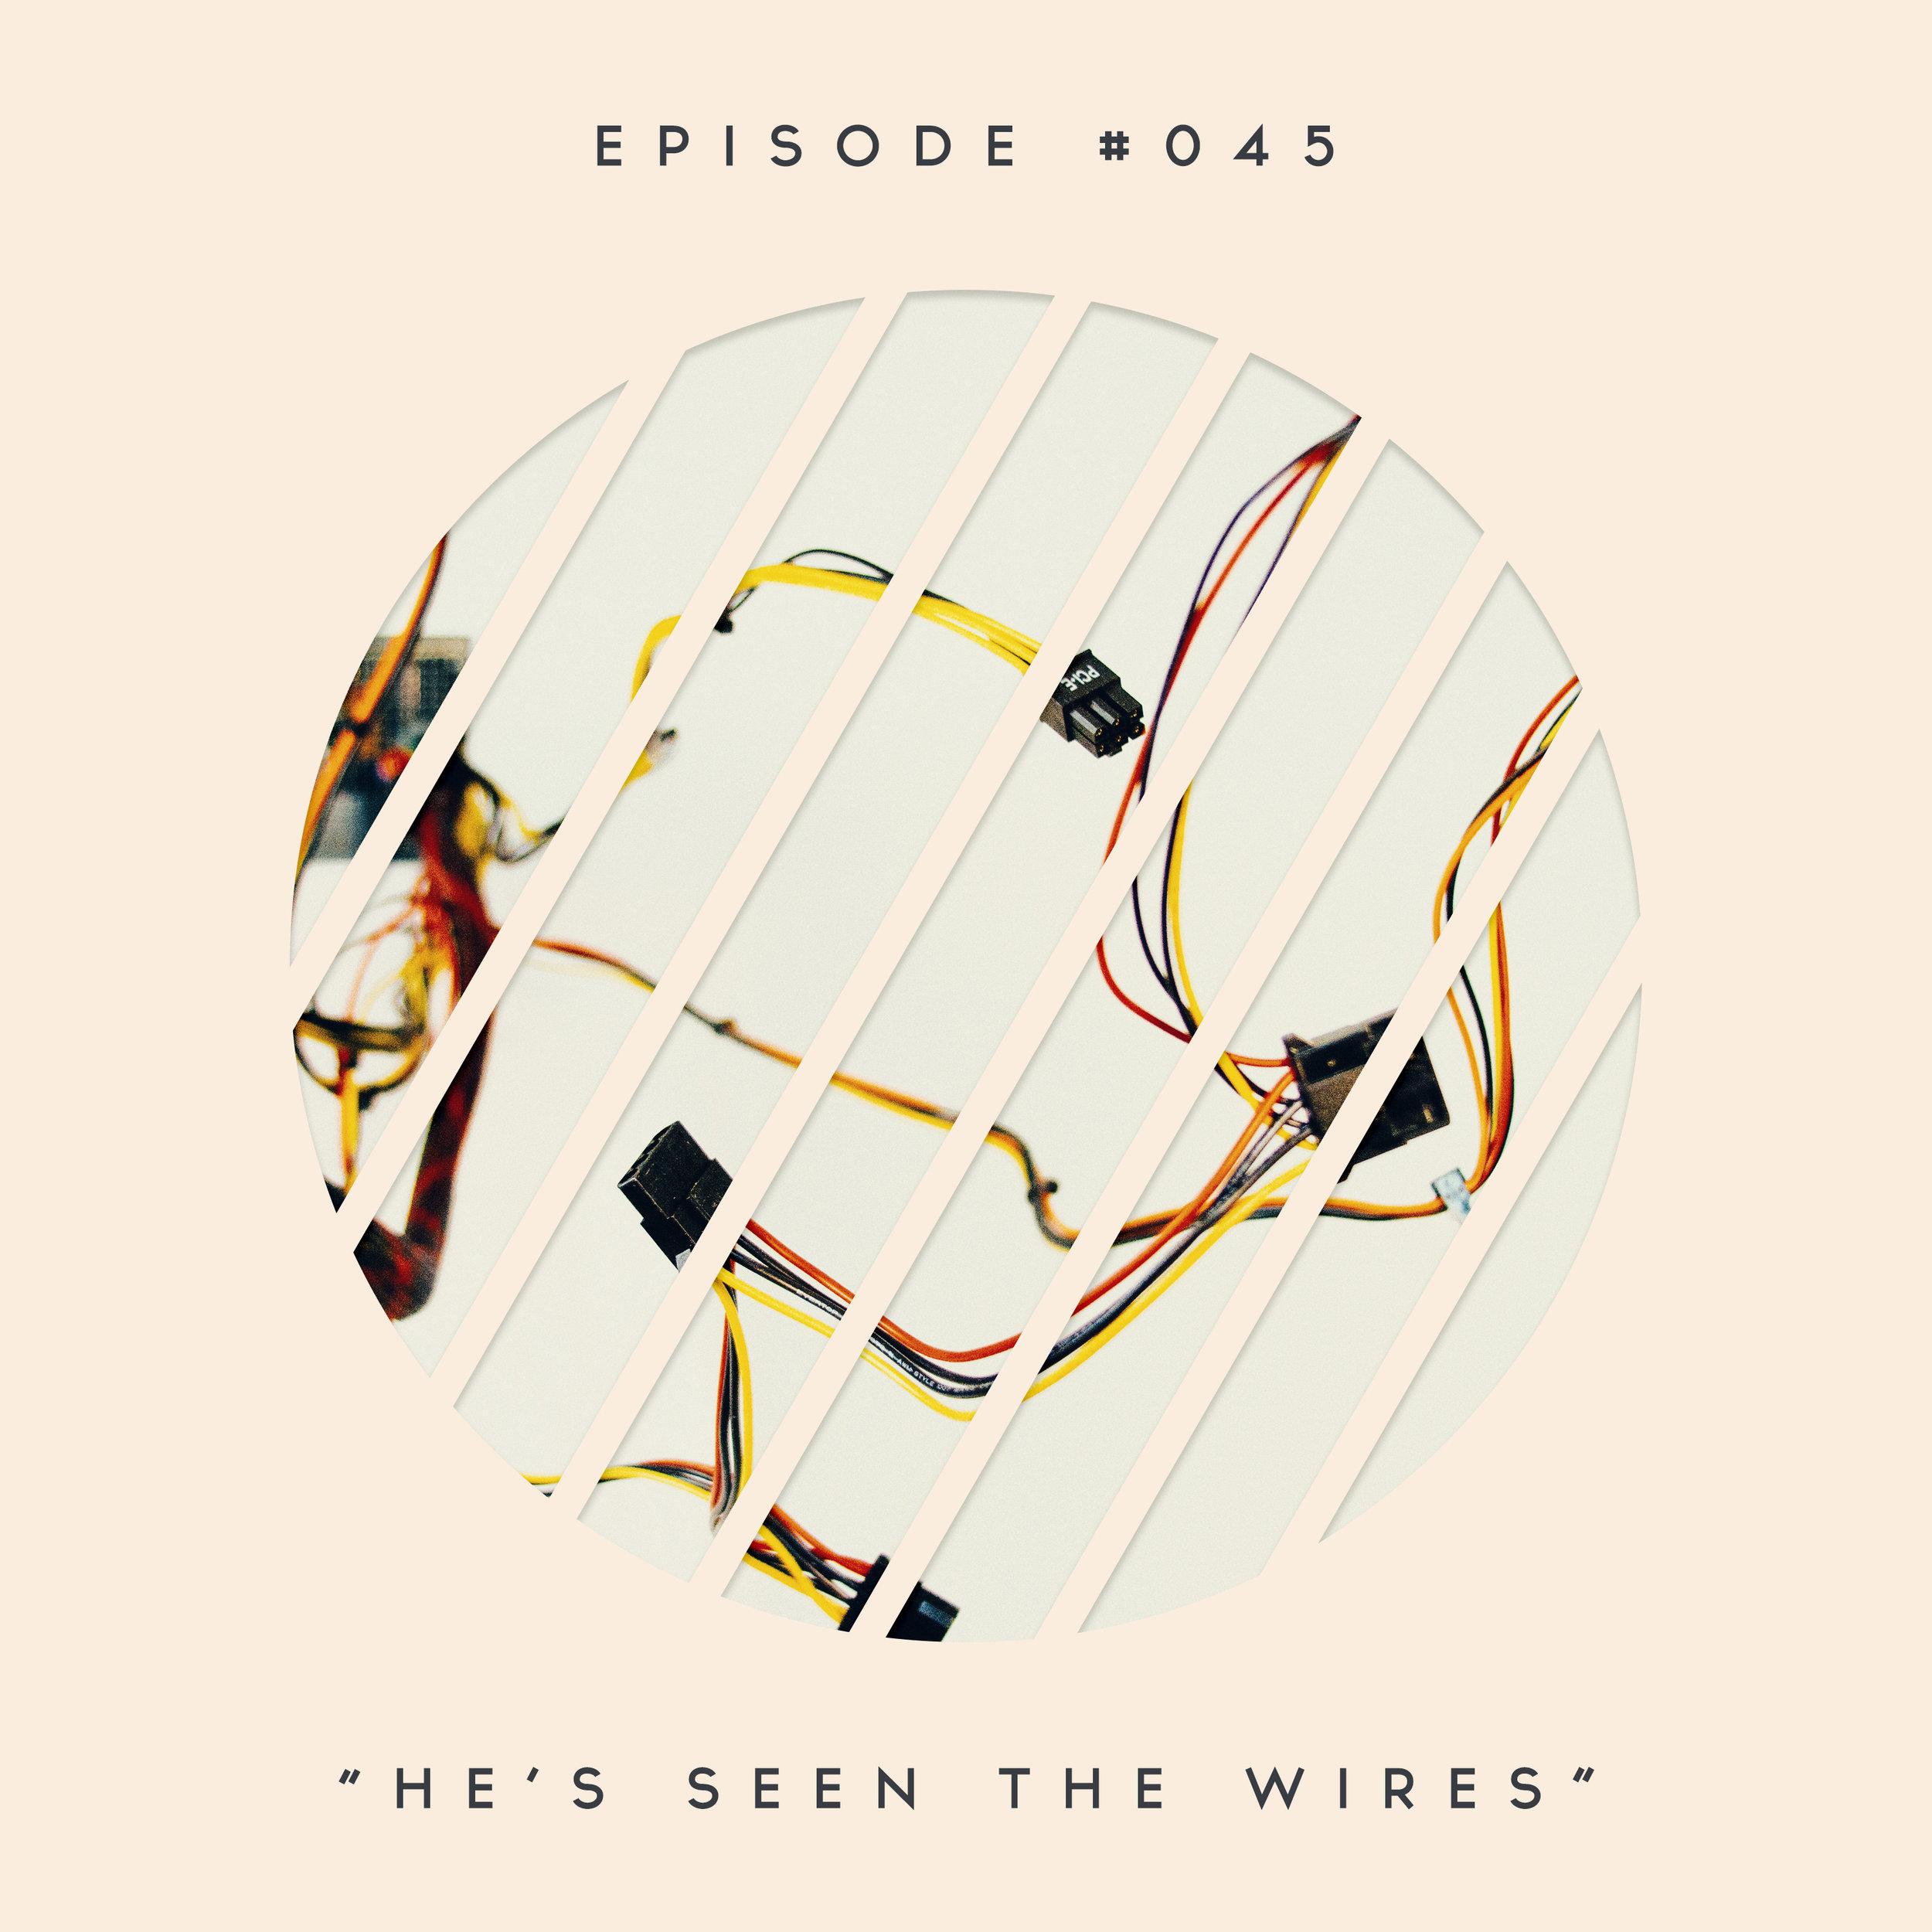 He's-Seen-the-Wires.jpg